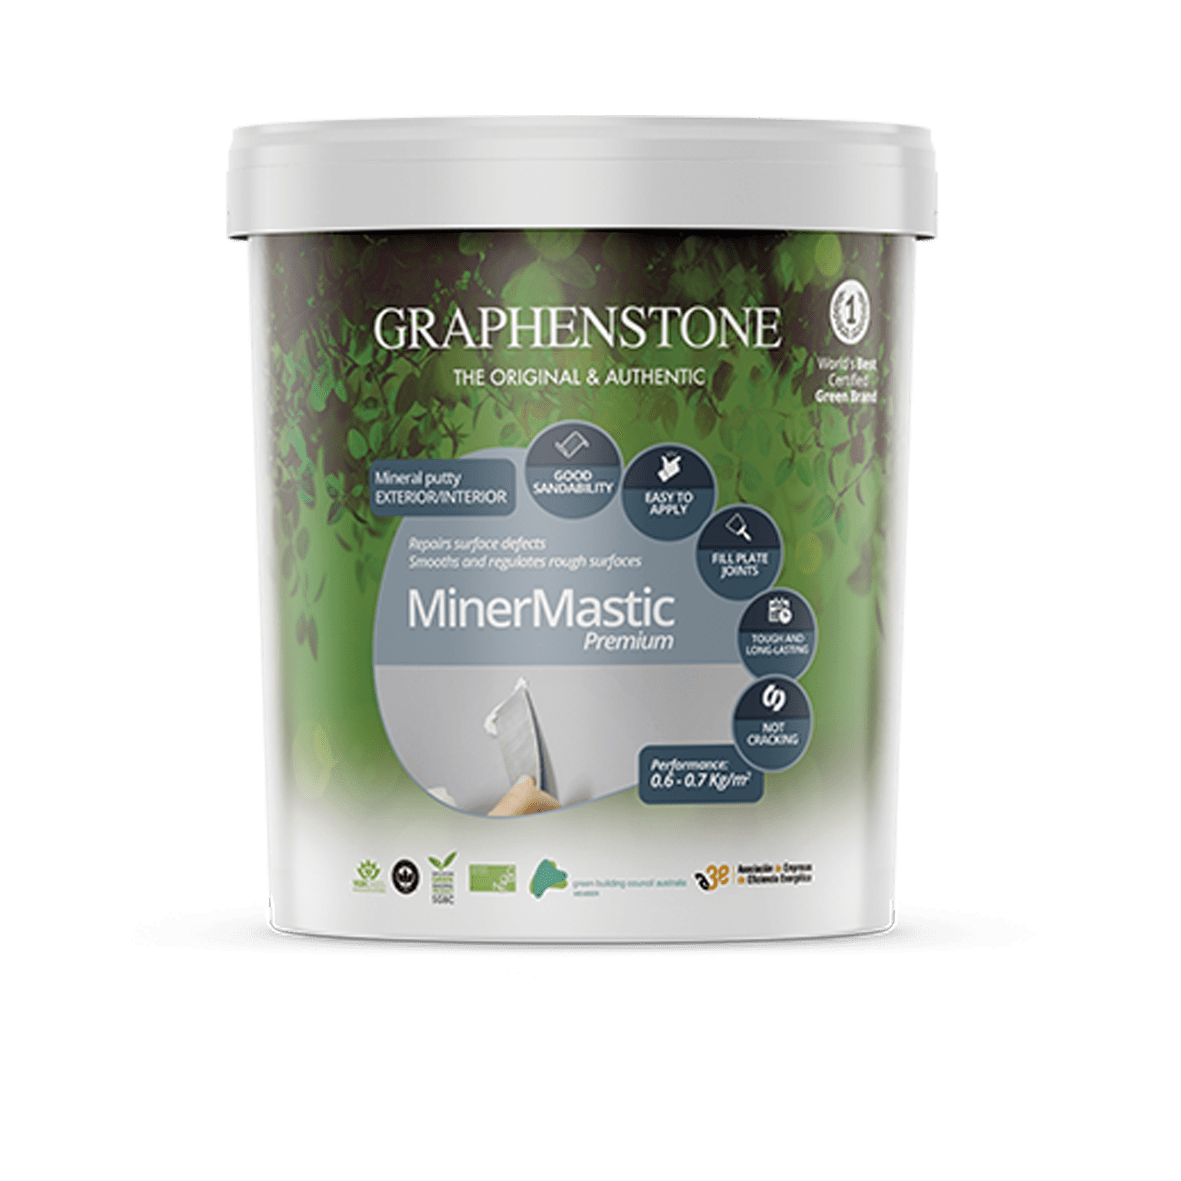 Natural Wall Filler - Graphenstone MinerMastic Mineral Defects Filler